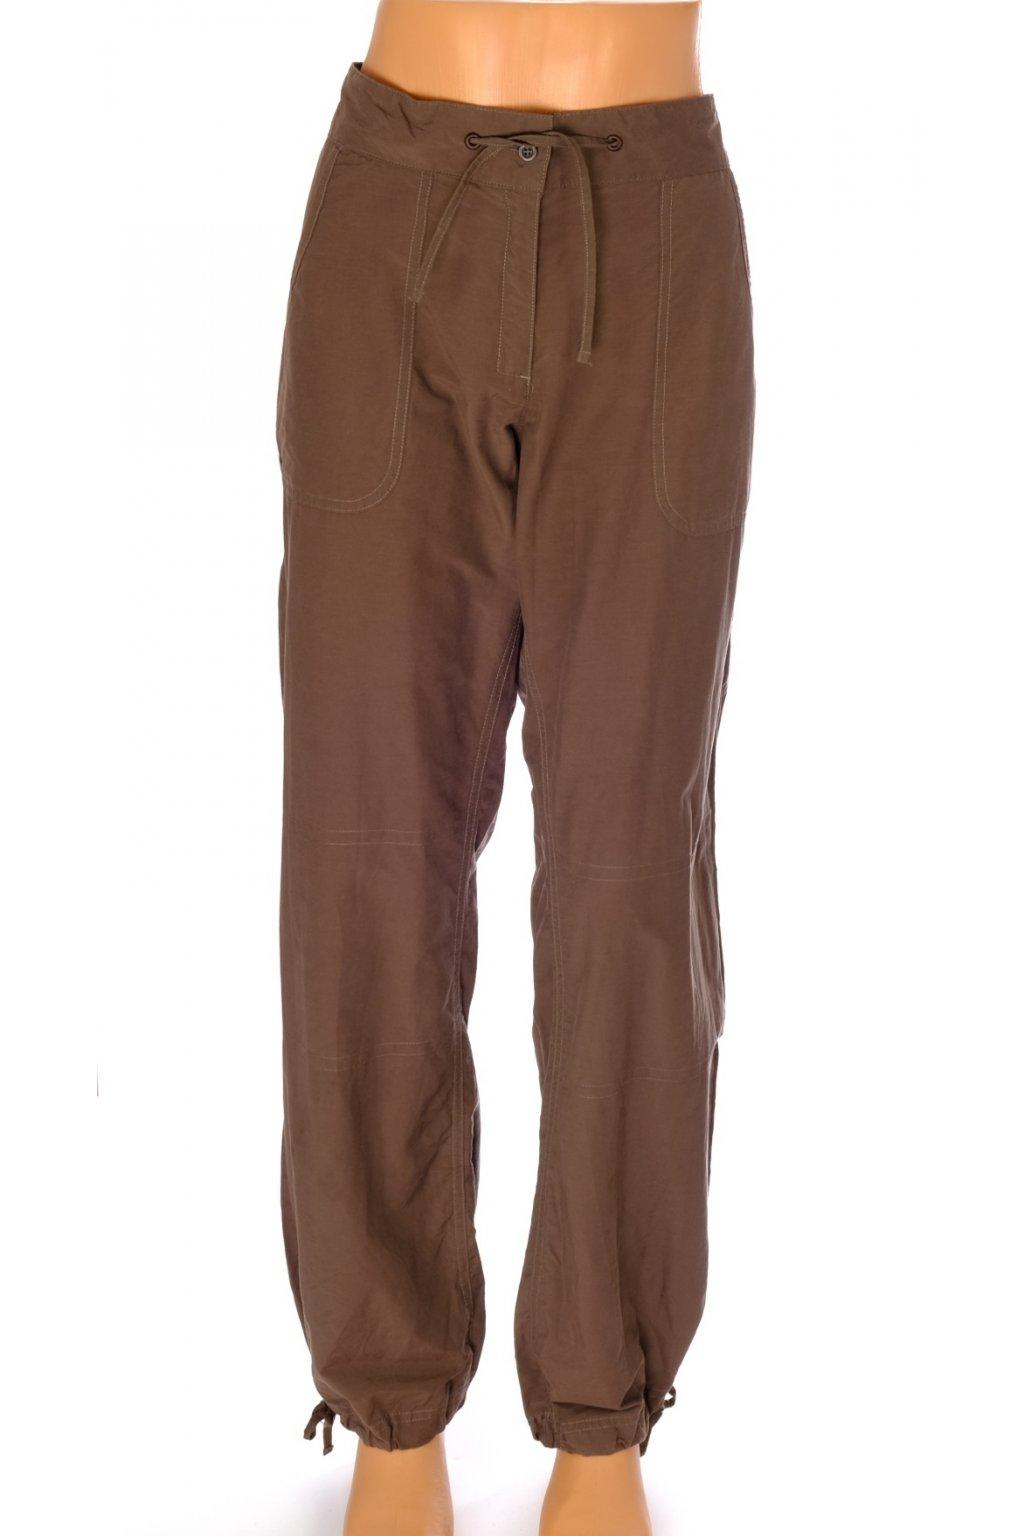 Kalhoty Quechua hnědé plátěné vel XL